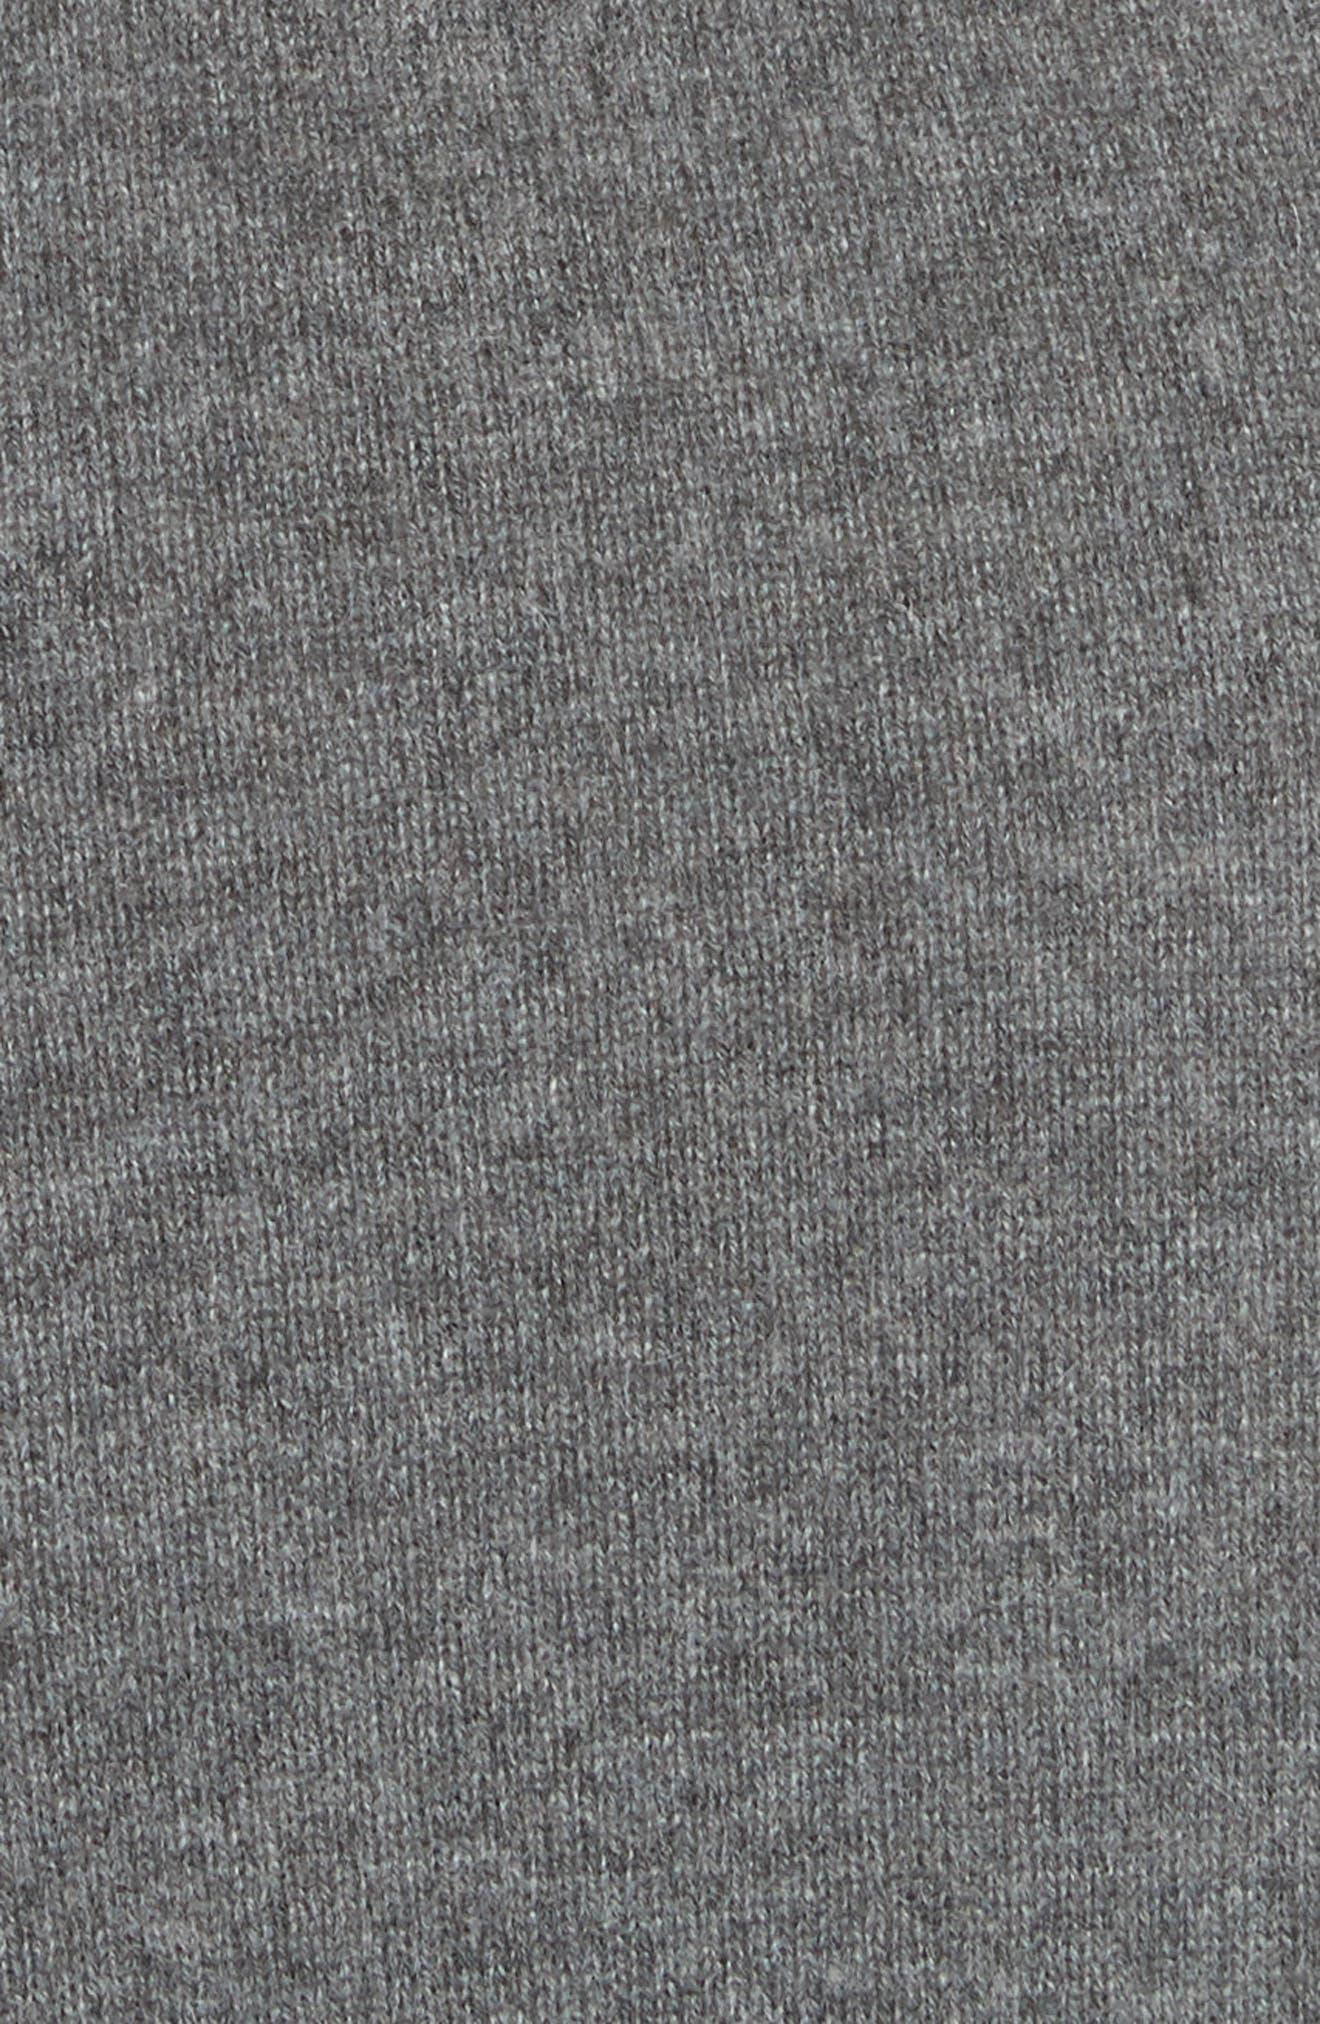 Diane Von Furstenberg Linda Cashmere Wrap Dress,                             Alternate thumbnail 5, color,                             001